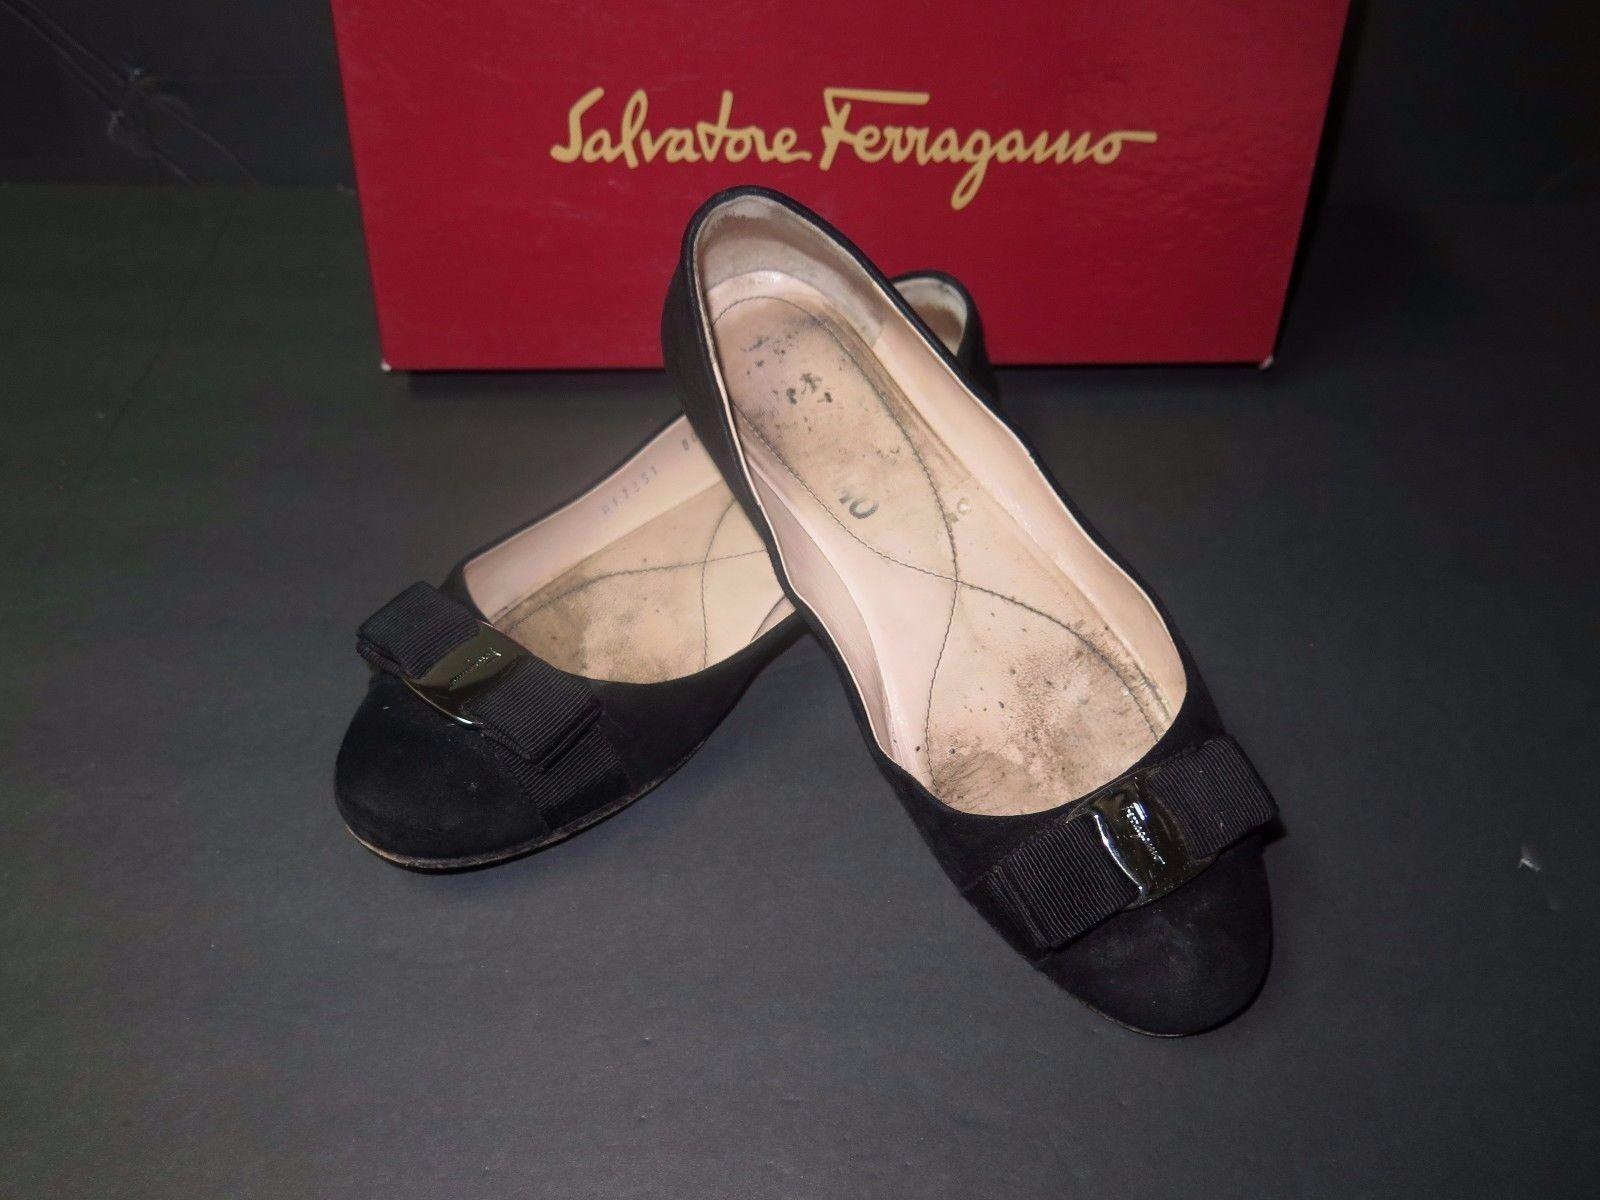 Diseñador Salvatore Ferragamo Negro Gamuza De Ballet Zapatos Planos Planos Planos 7-1 2 2A Italia Usado  lo último